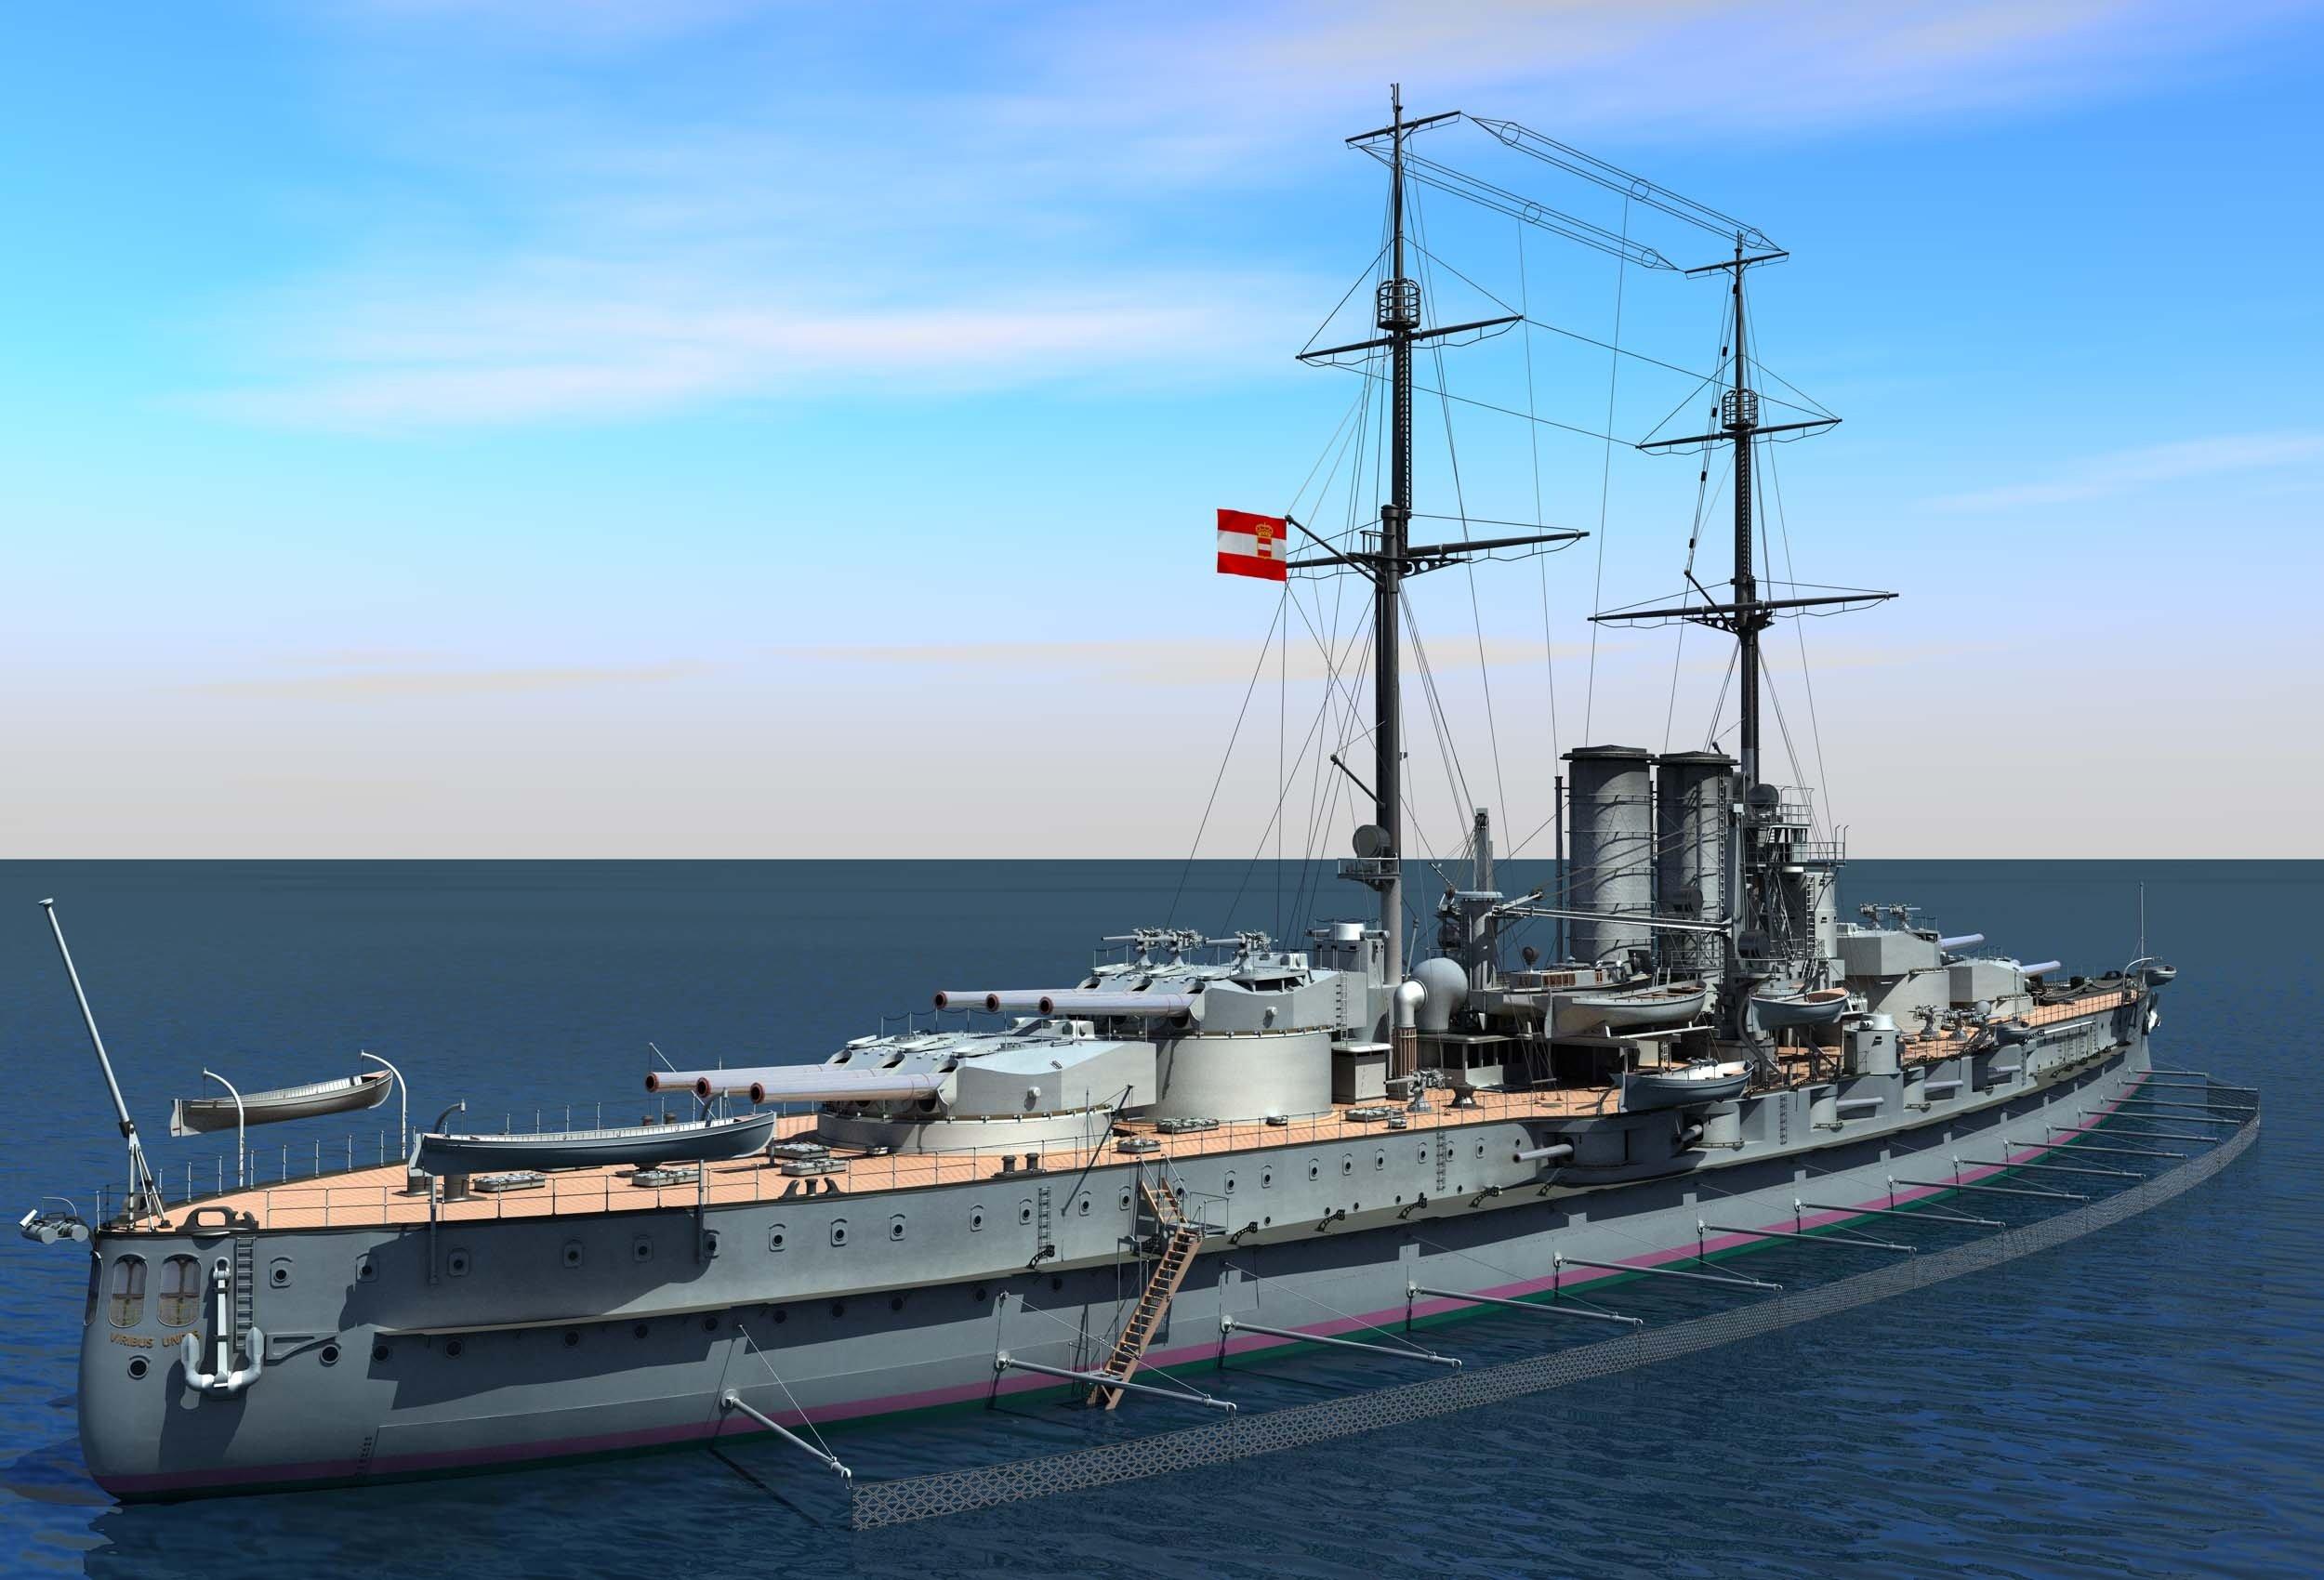 https://0901.nccdn.net/4_2/000/000/038/2d3/CK79-Full-Ship-Starboard-Stern-Ocean-2500x1700.jpg